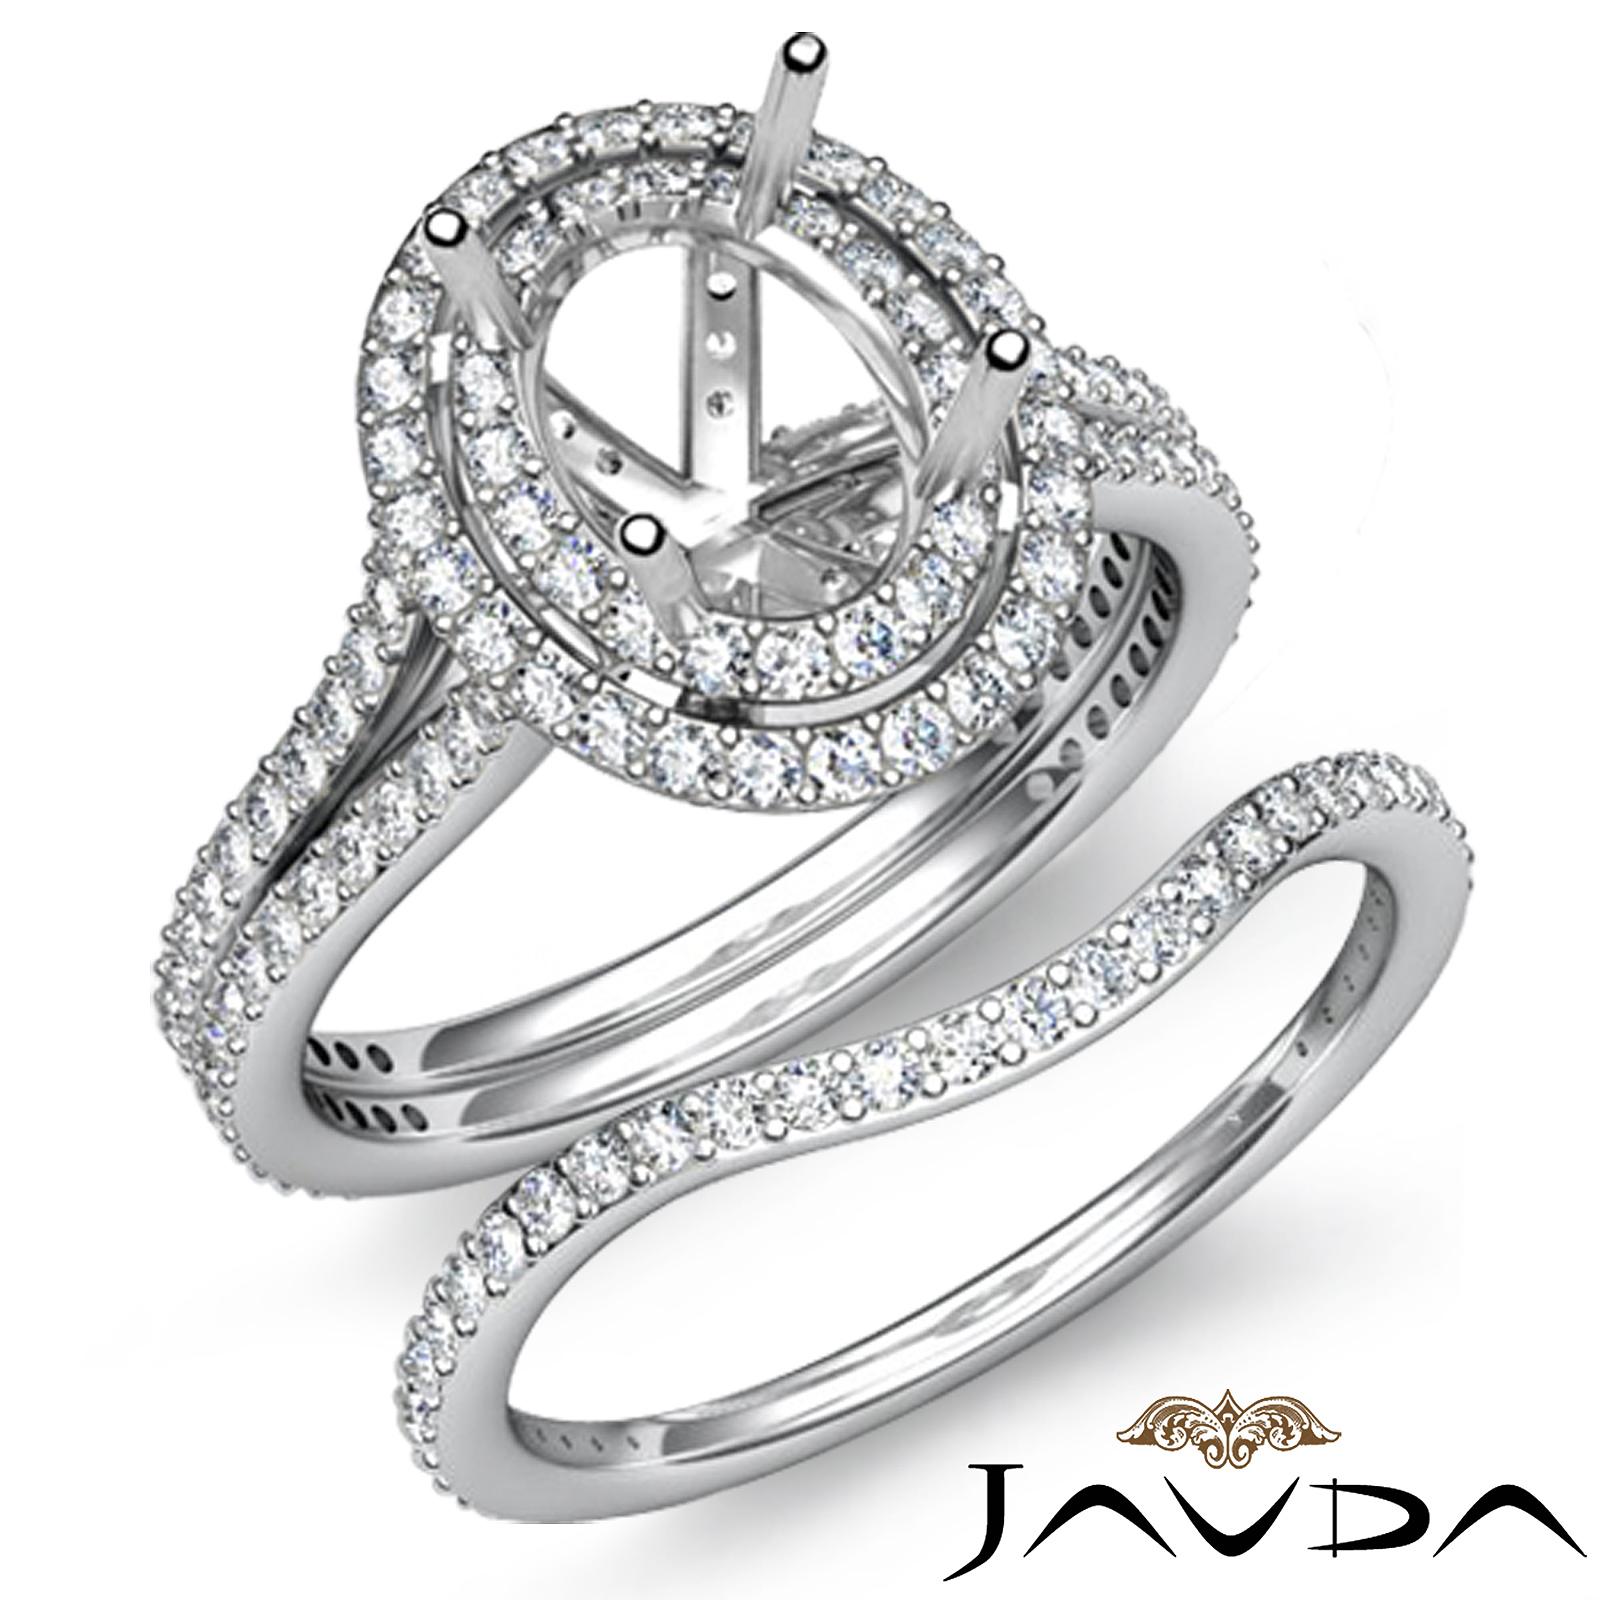 Diamond Engagement Ring Oval Split Shank Bridal Set Platinum 950 Semimount 2